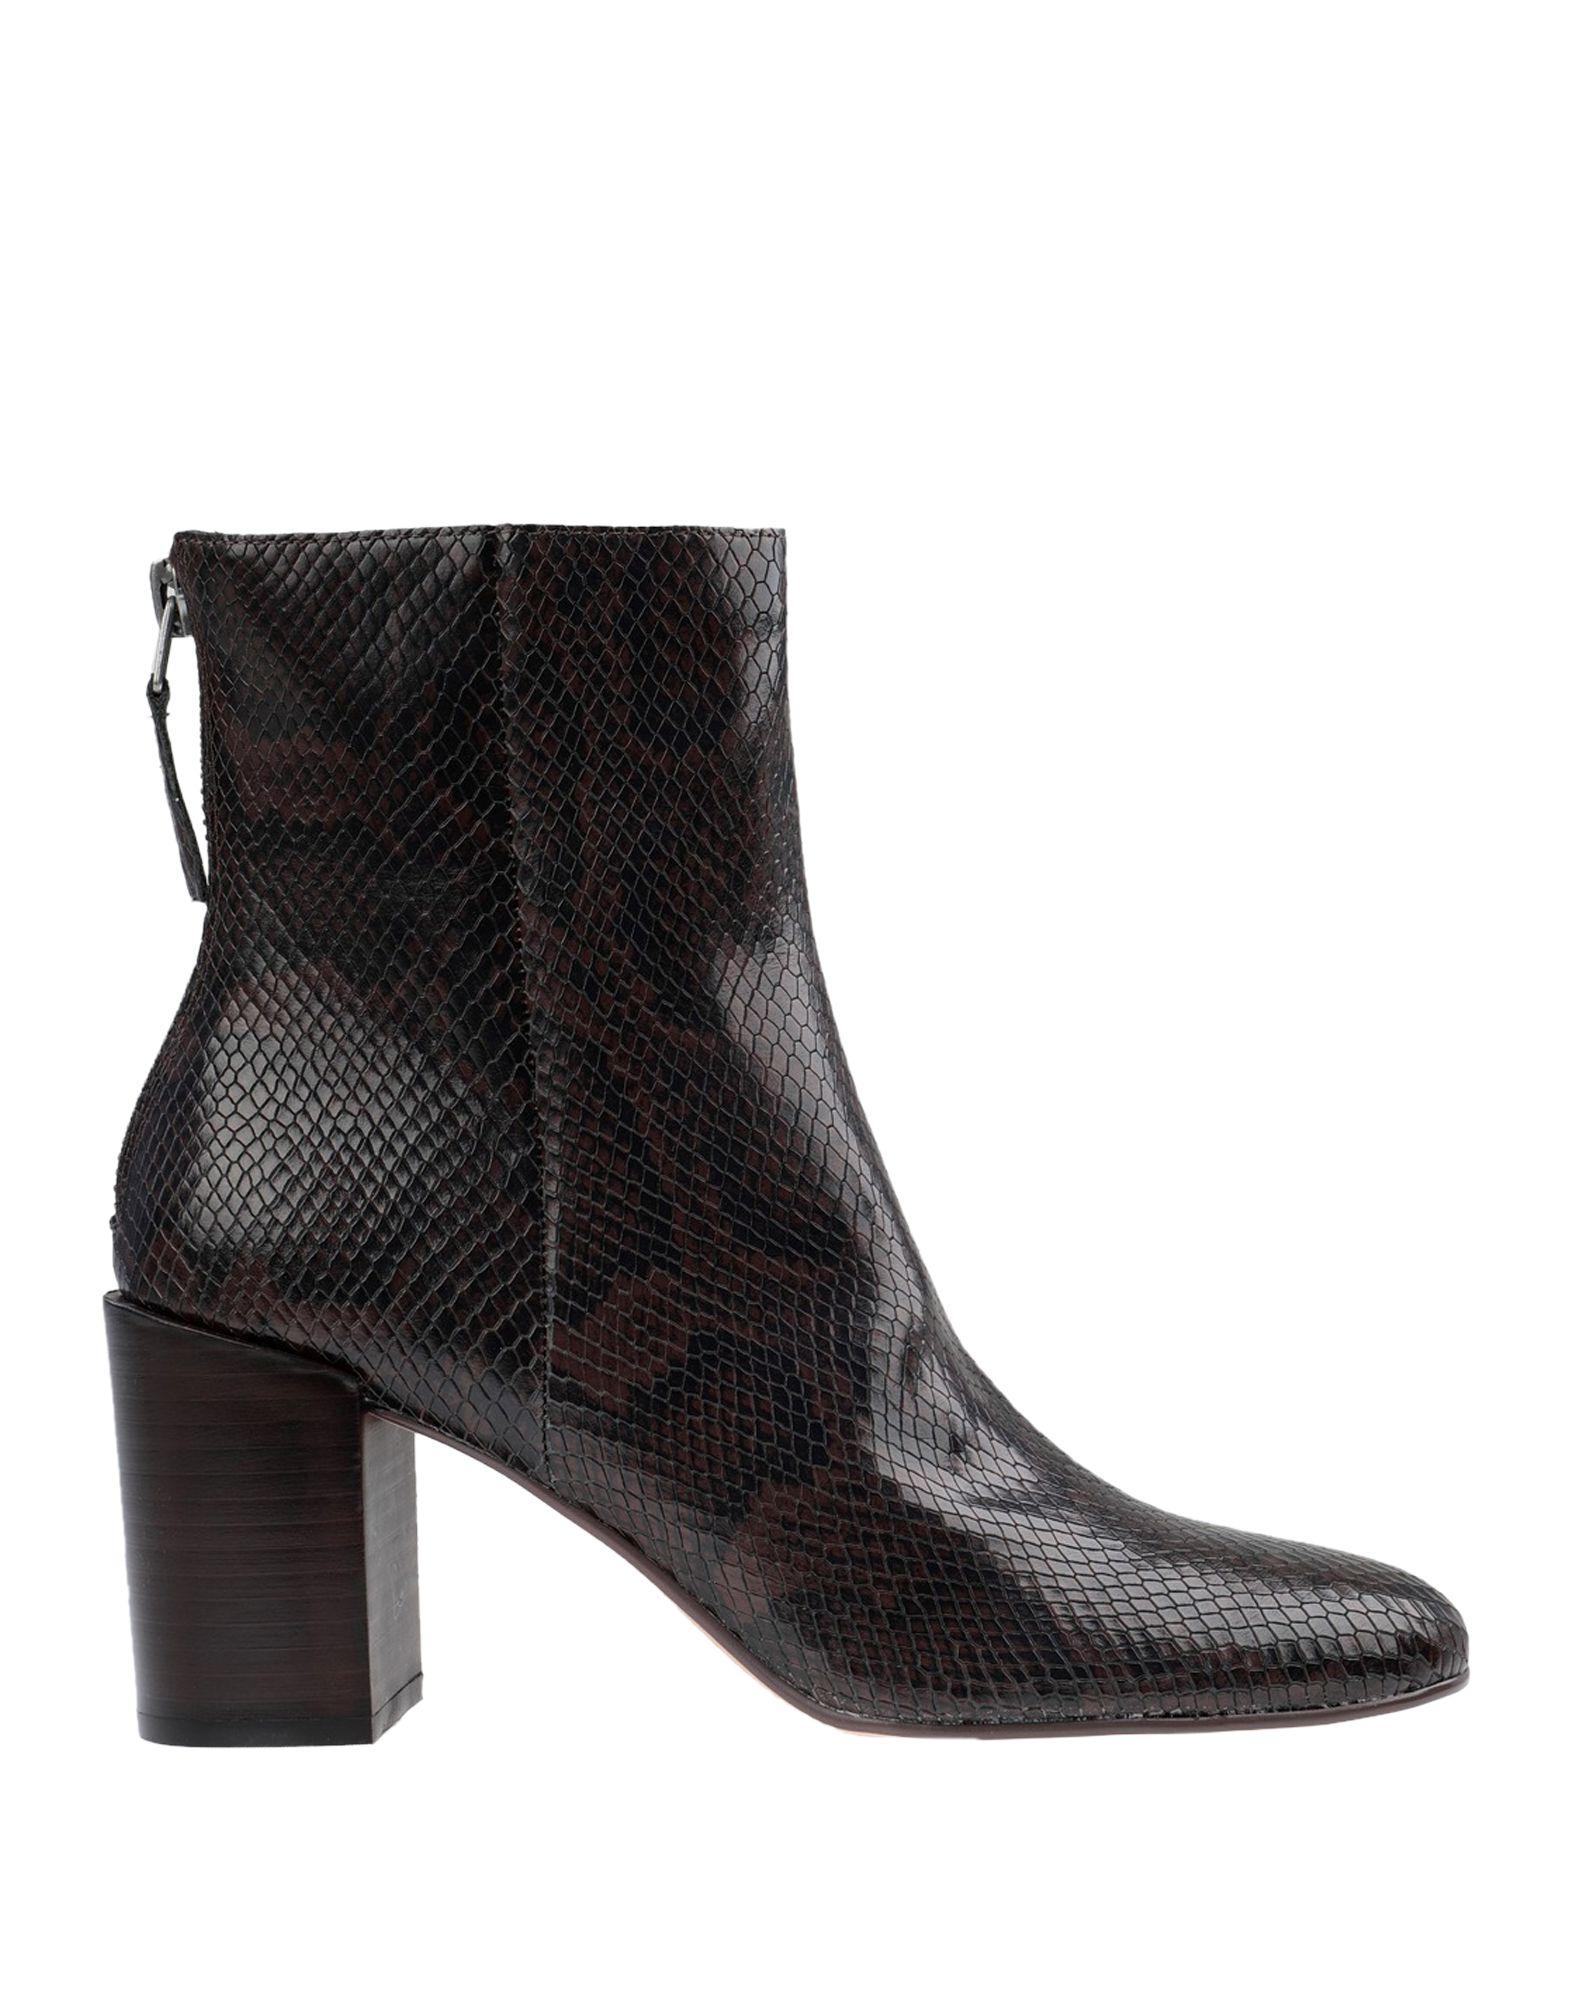 DOLCE VITA Полусапоги и высокие ботинки ботинки dolce vita dolce vita mp002xw1g46l